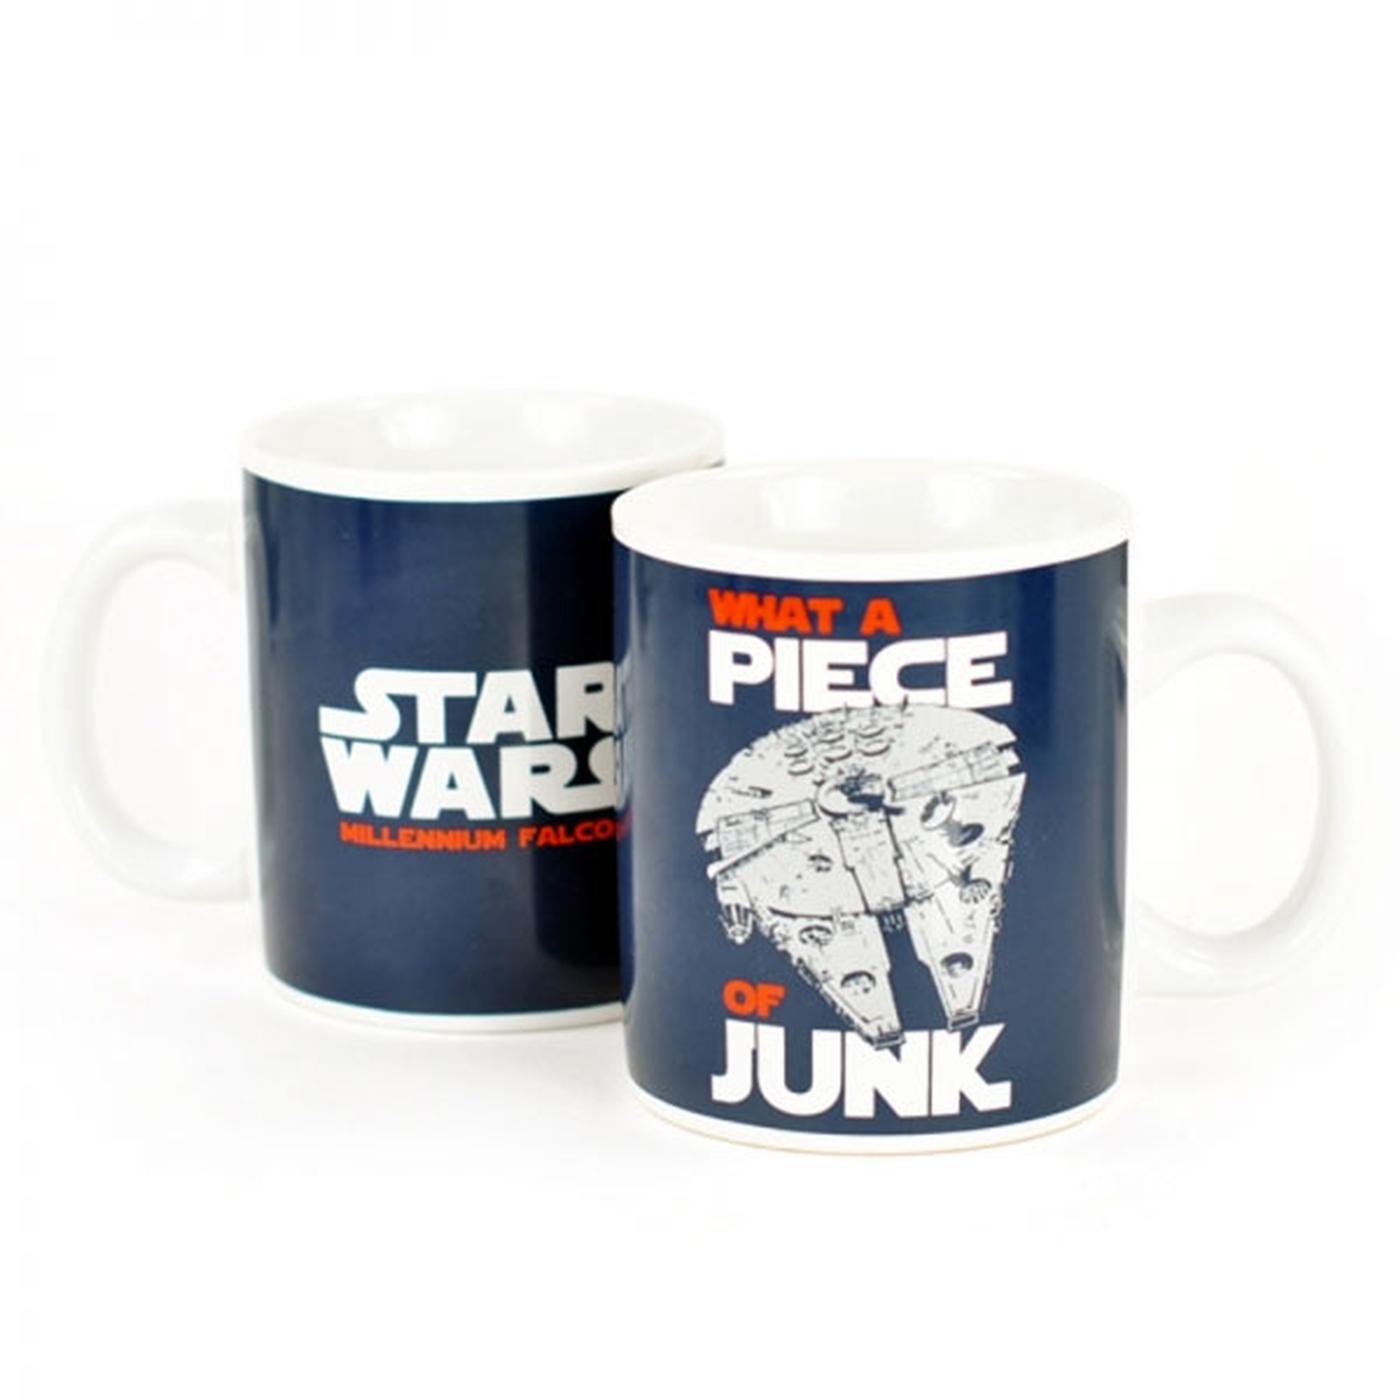 Star Wars Piece Of Junk Millennium Falcon Mug